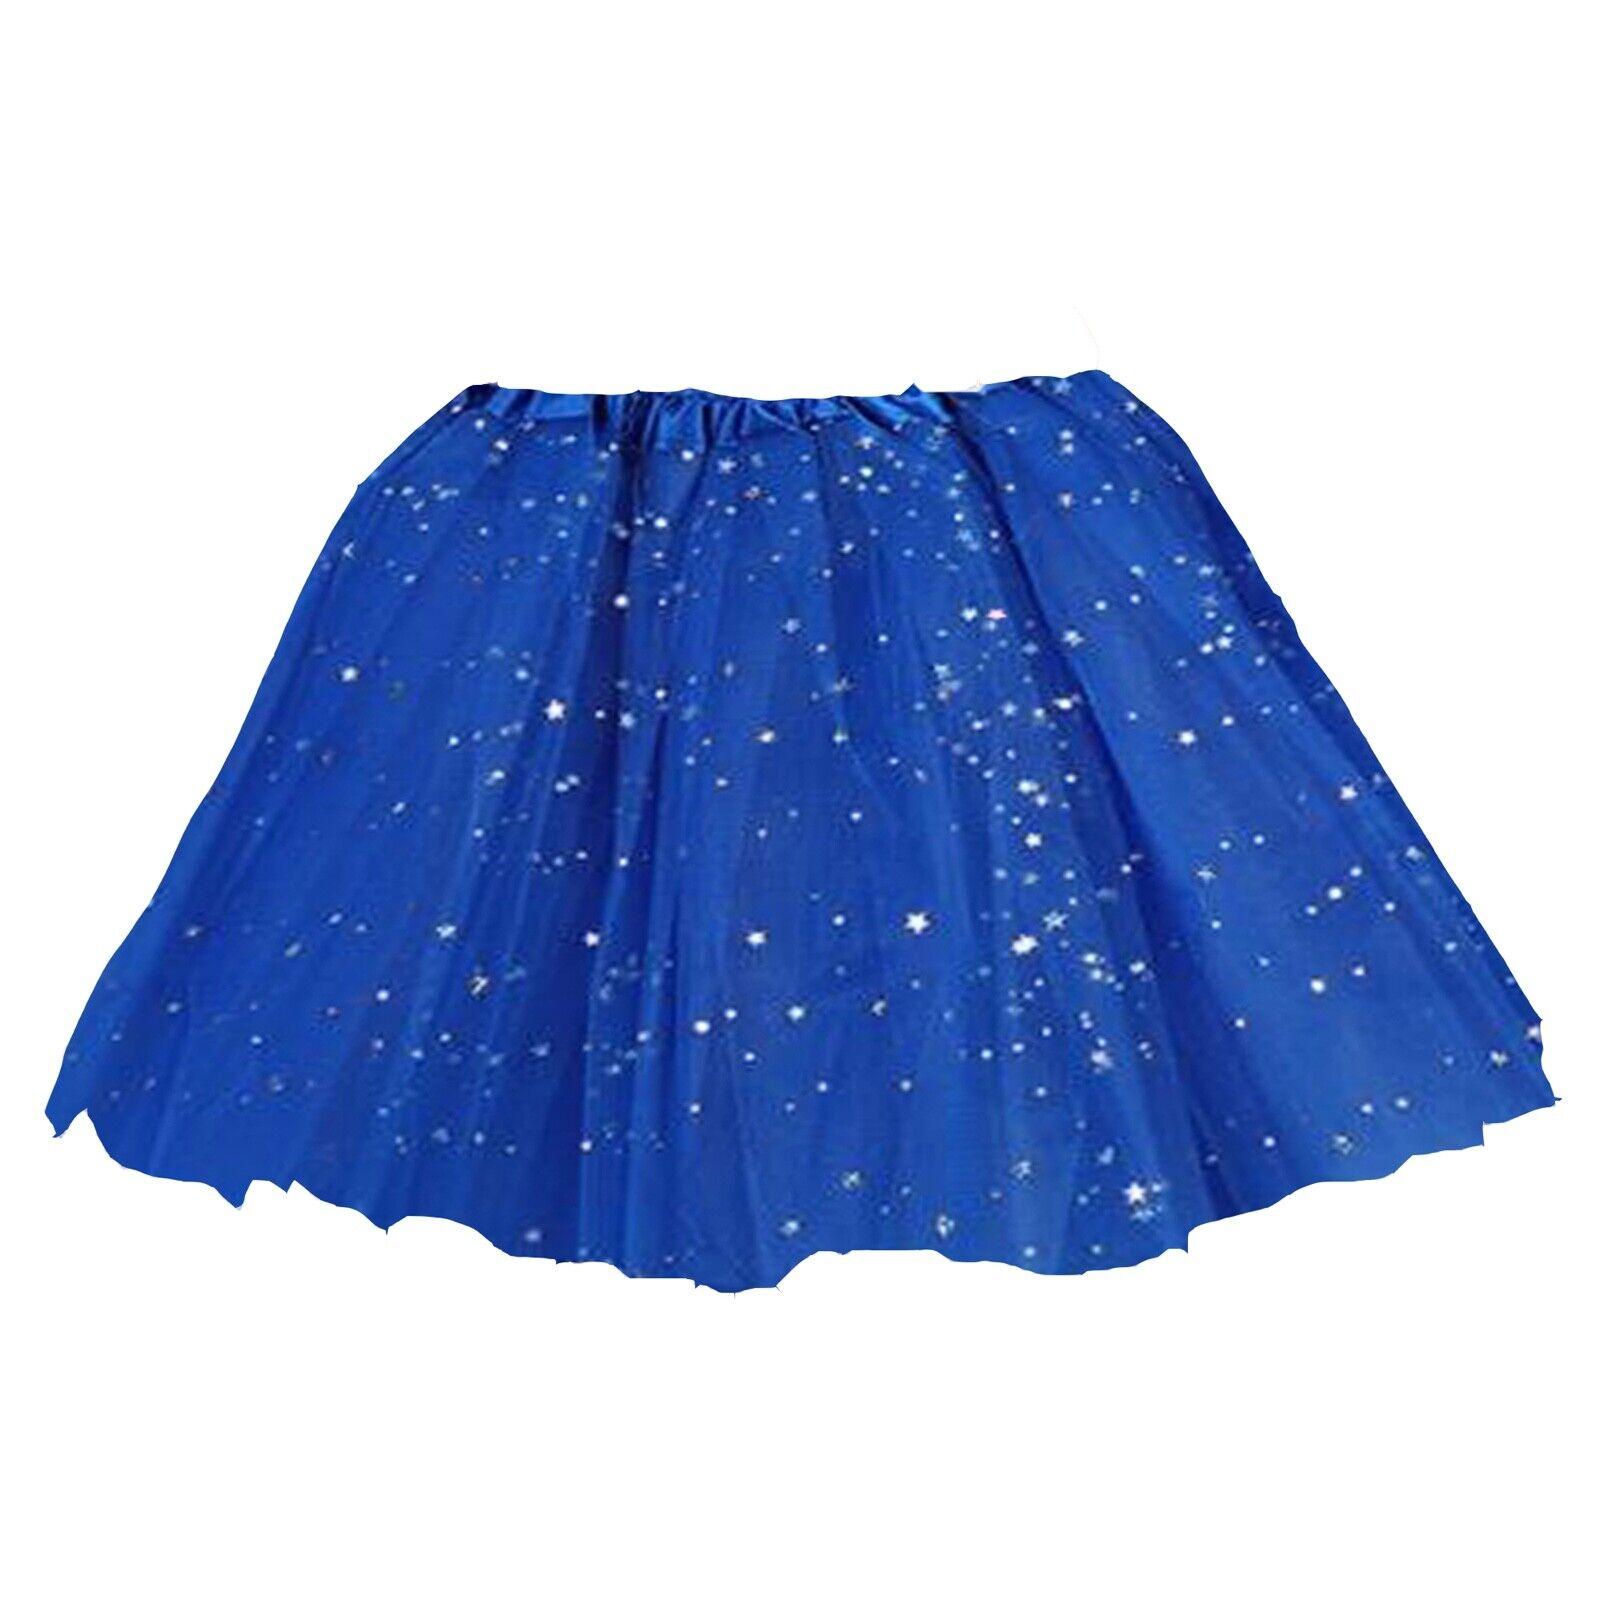 Tüll Rock Tütü Tutu Tüllrock Ballettrock Petticoat Balletkleid 3lagig Apricot